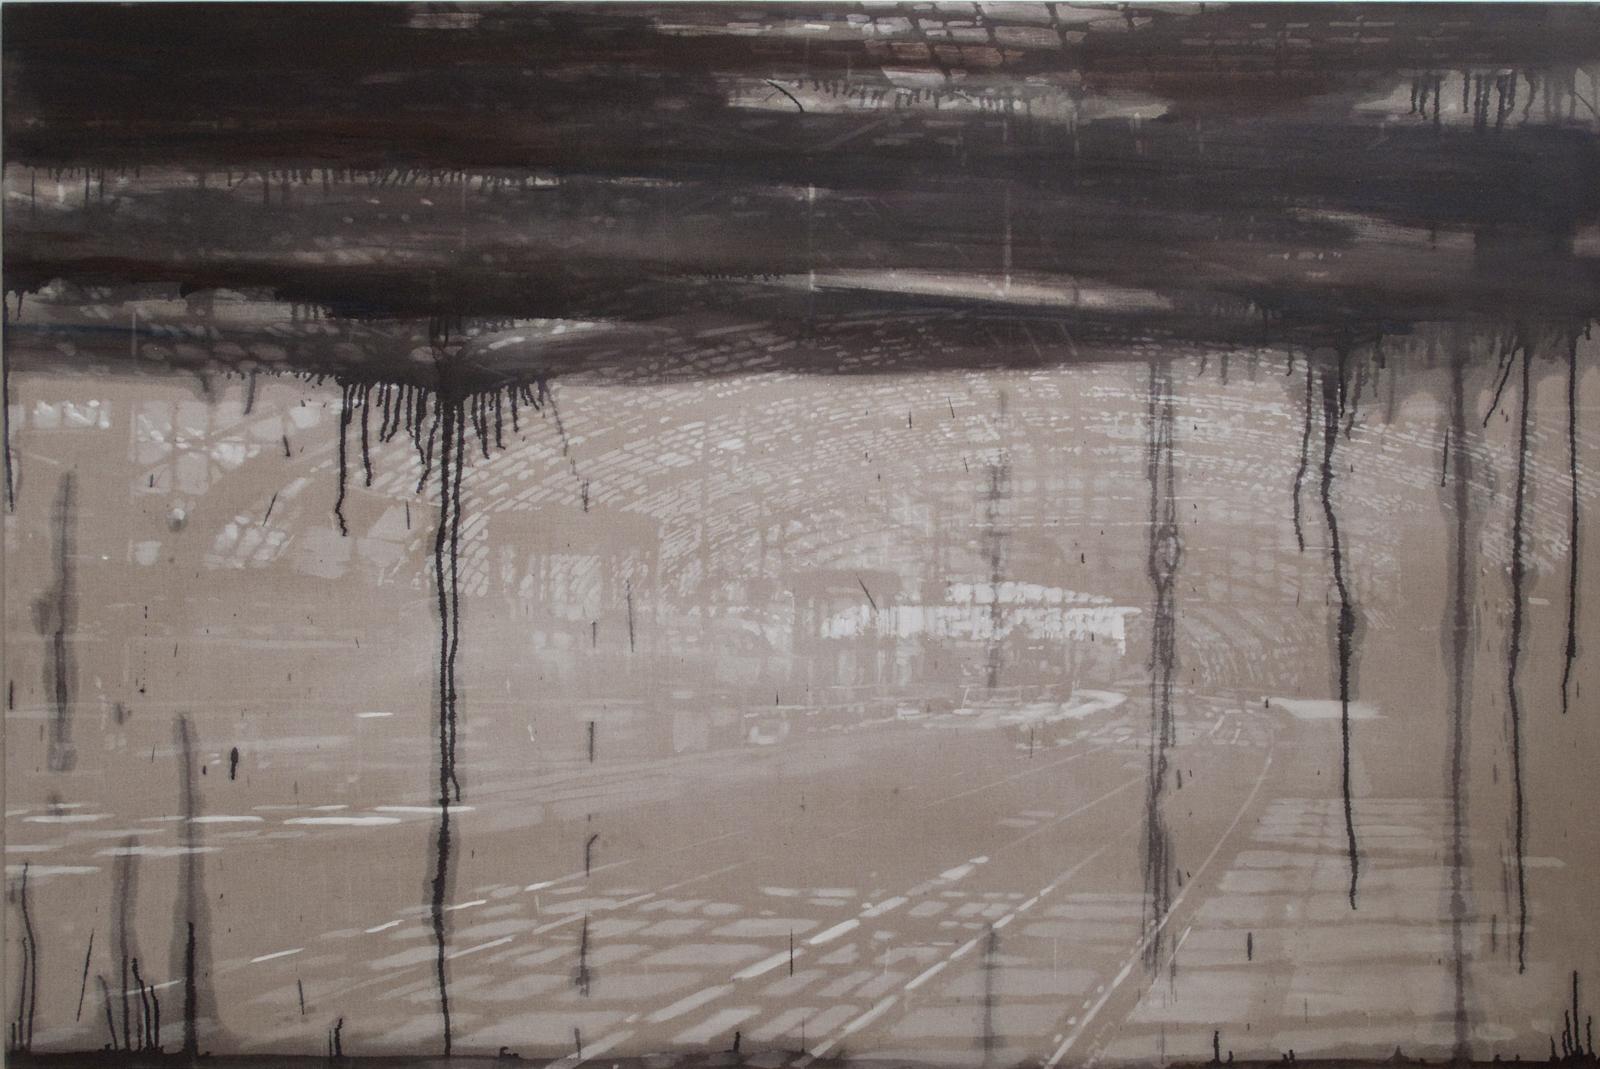 Tungt / Heavy, 160 x 240 cm 2009